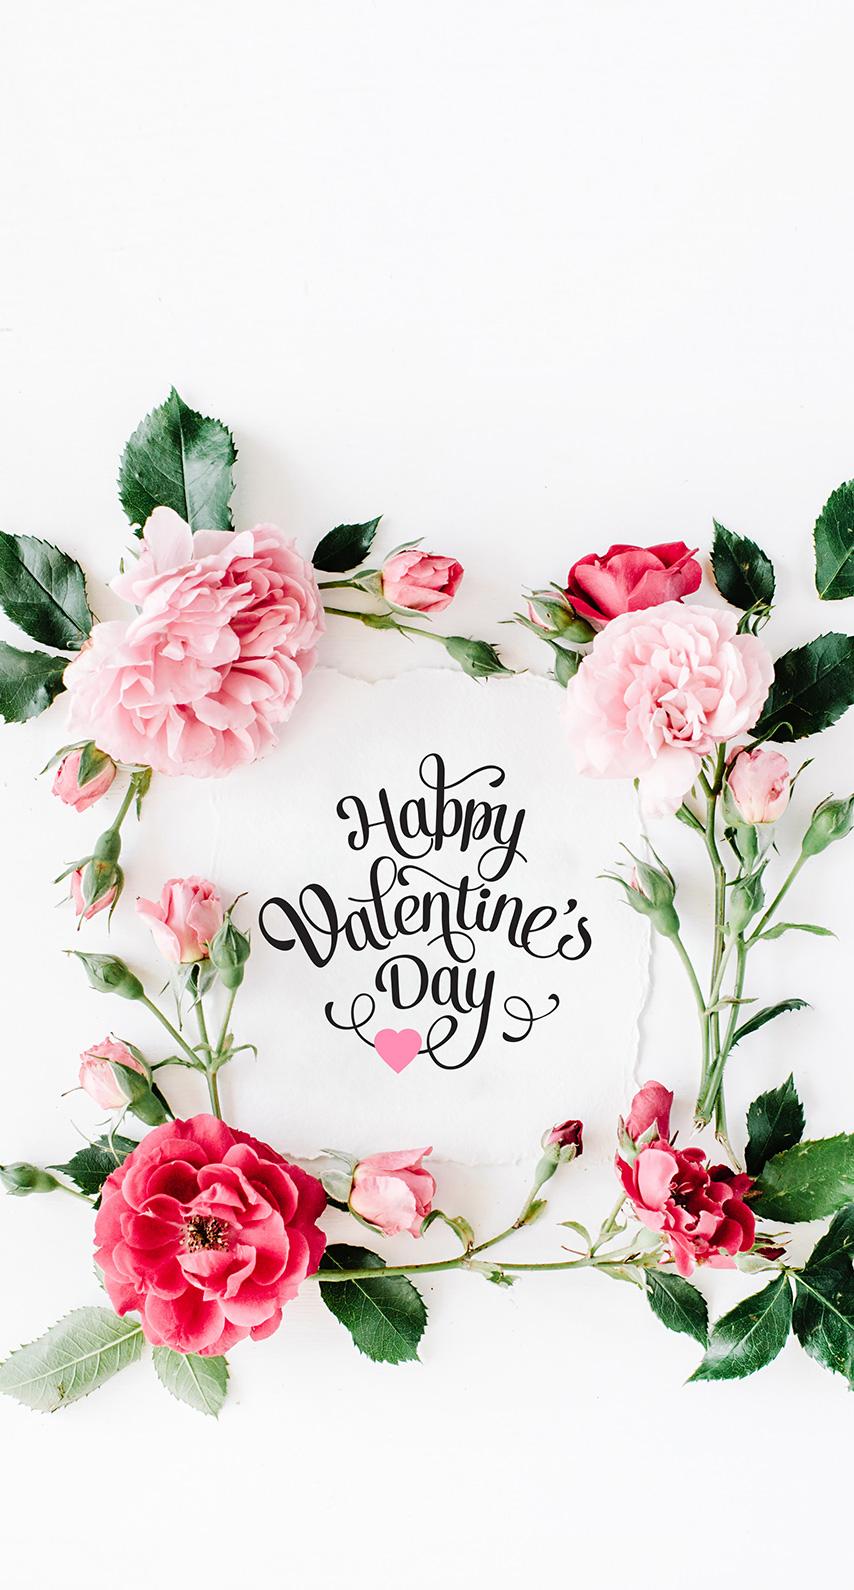 romance, gift